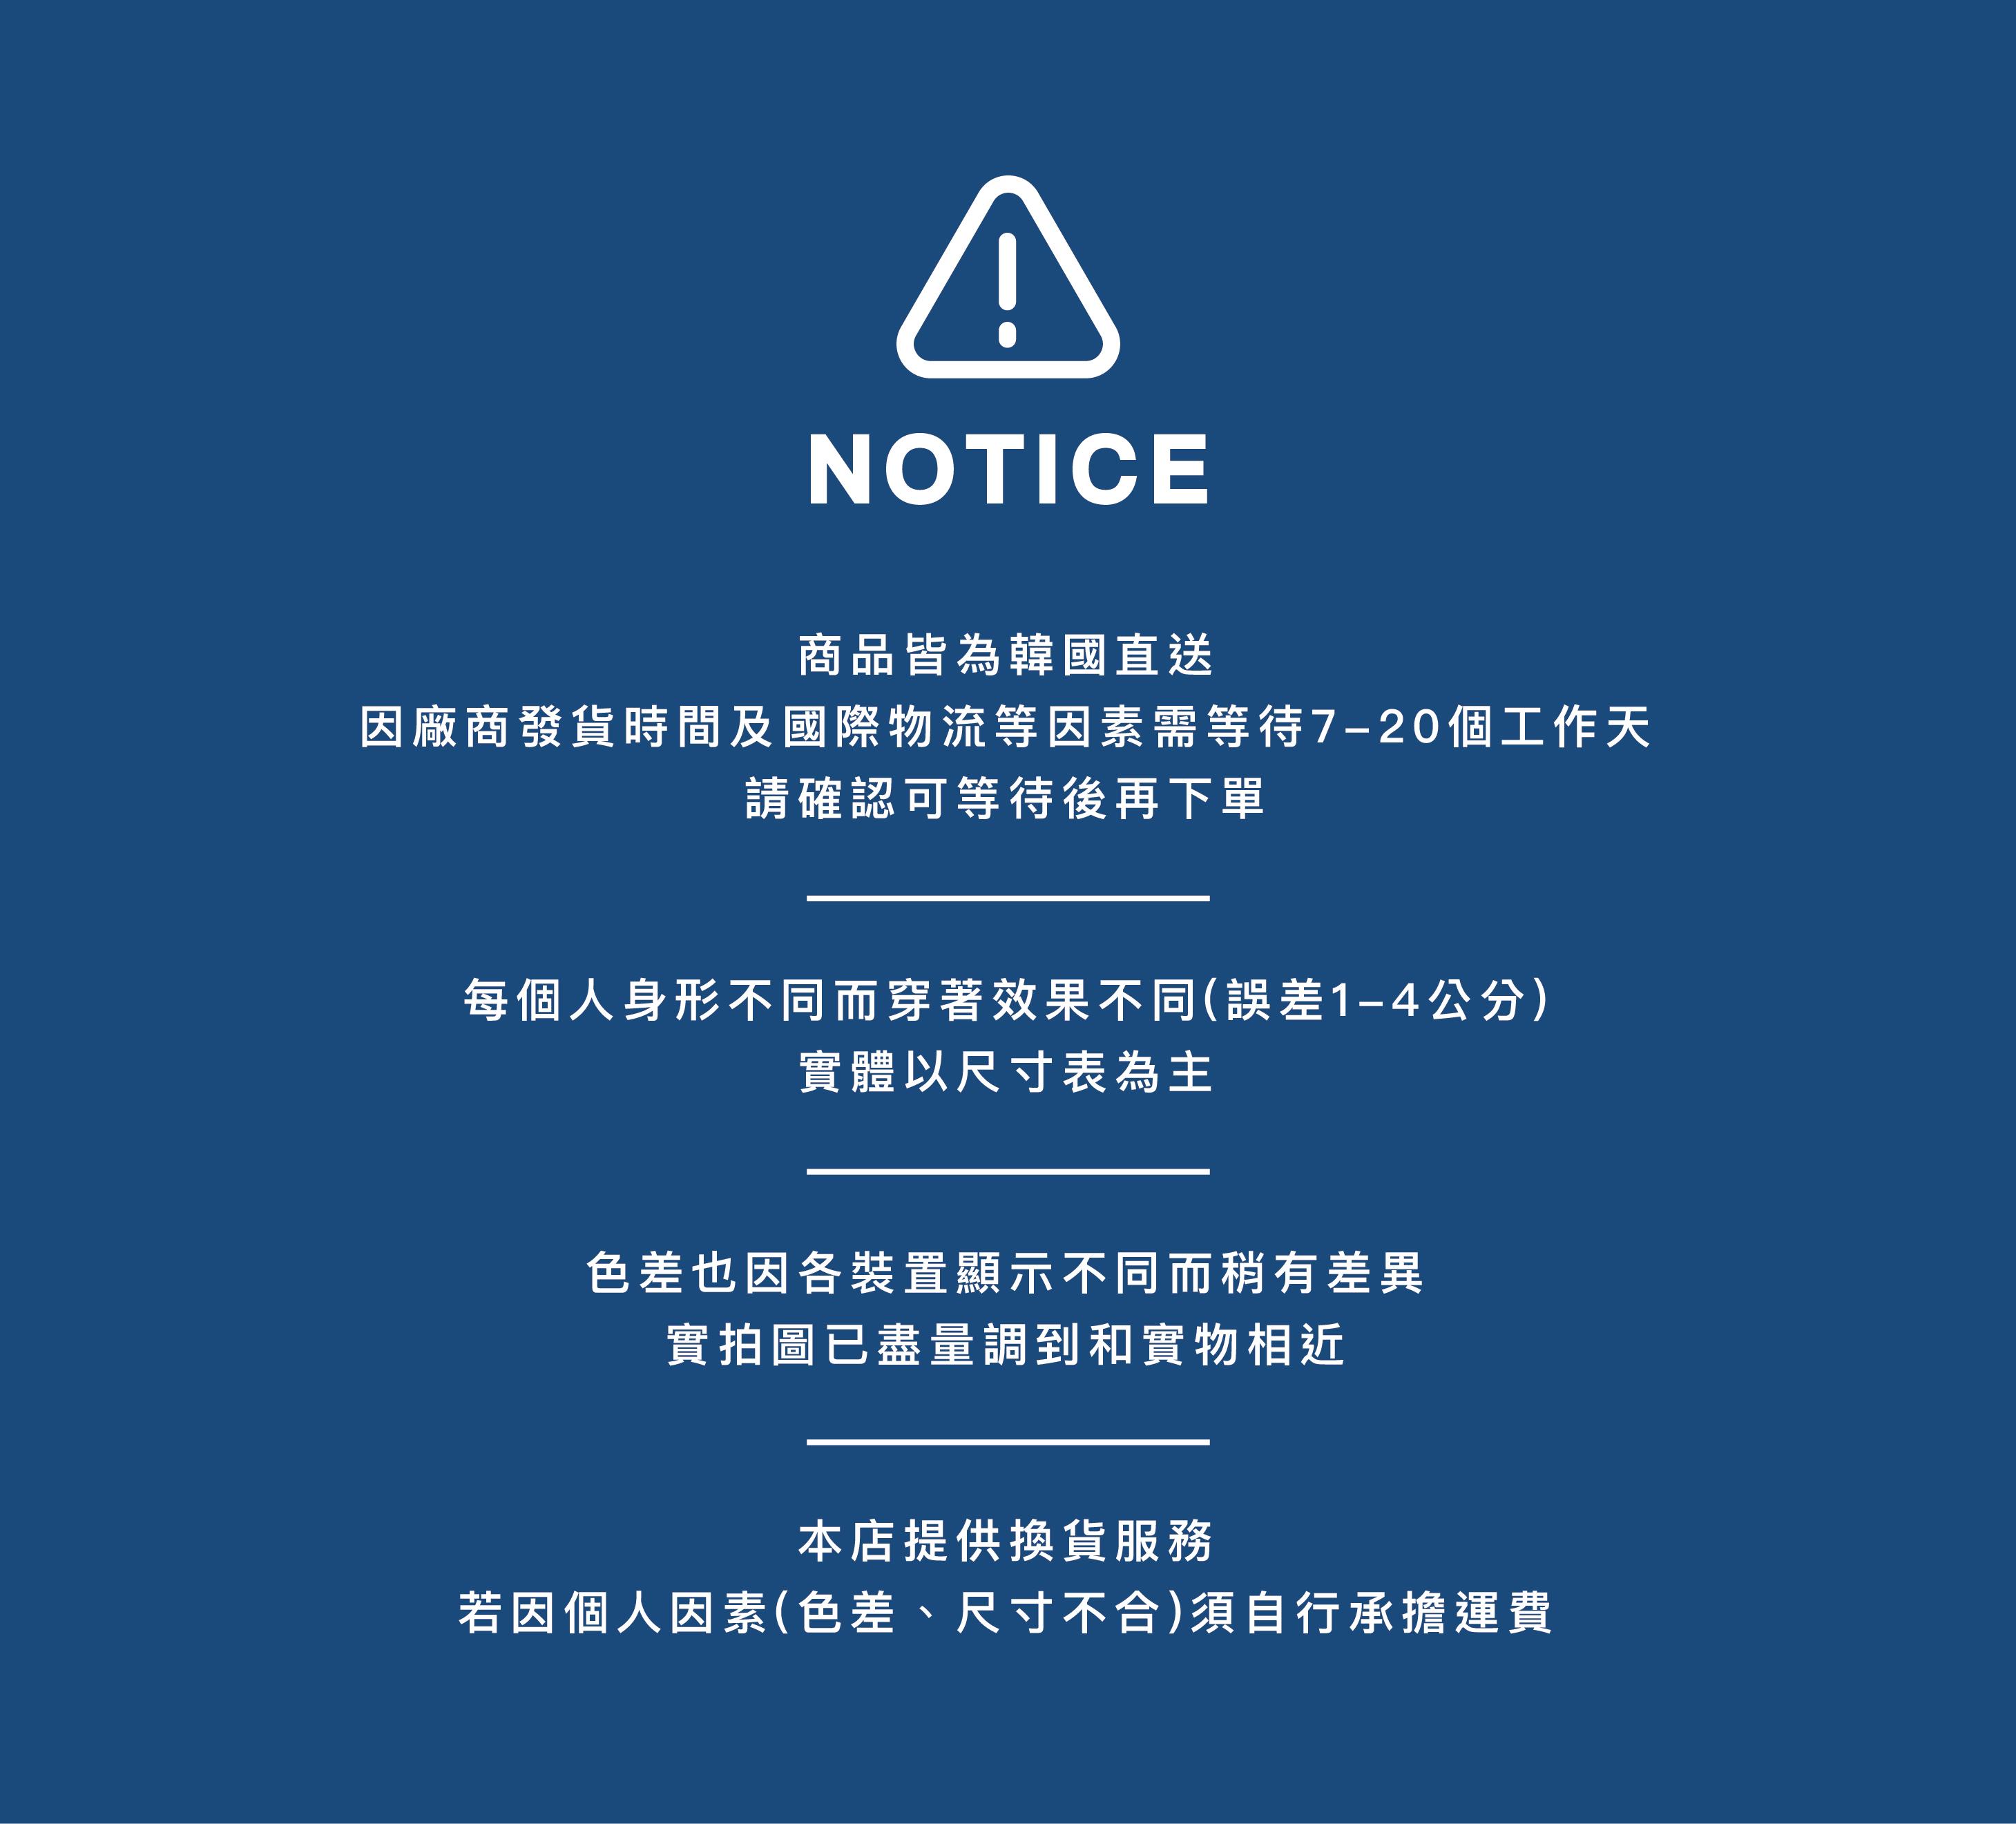 NOTICE-1-02.jpg